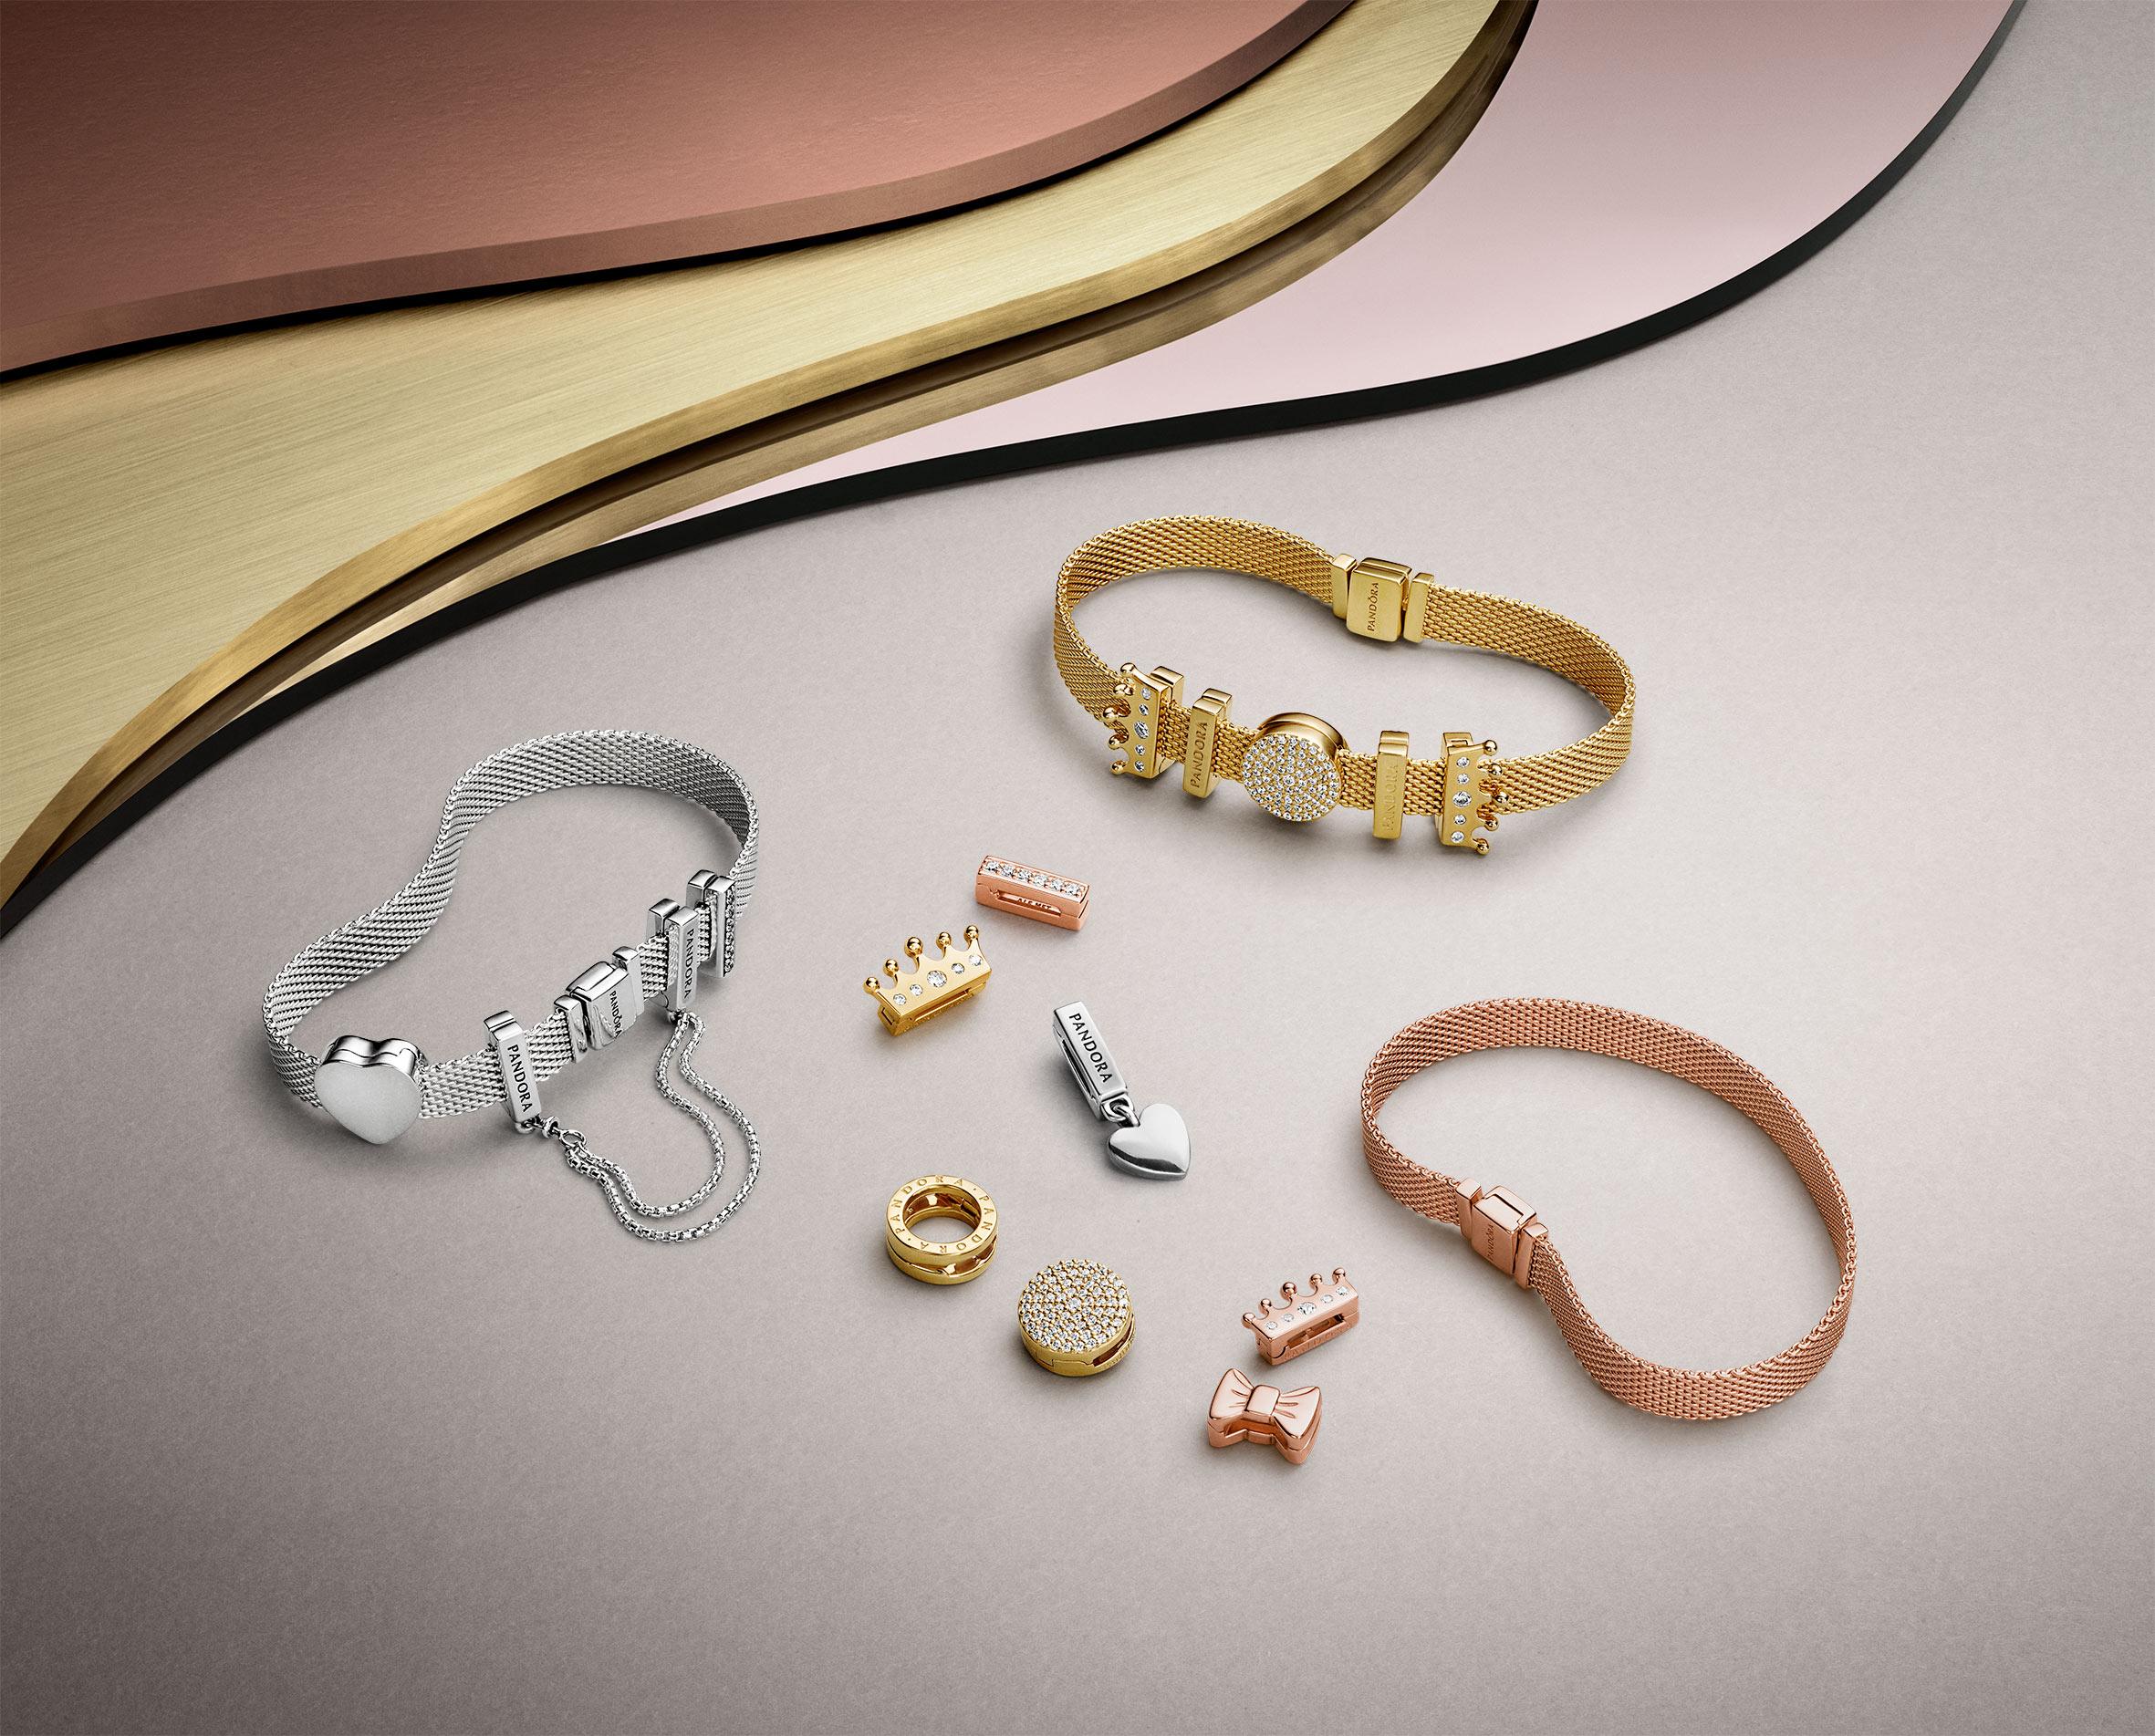 Pandora Reflexions  Κοσμήματα για την πιο stylish καλεσμένη σε γάμο ... 15b84ba6189